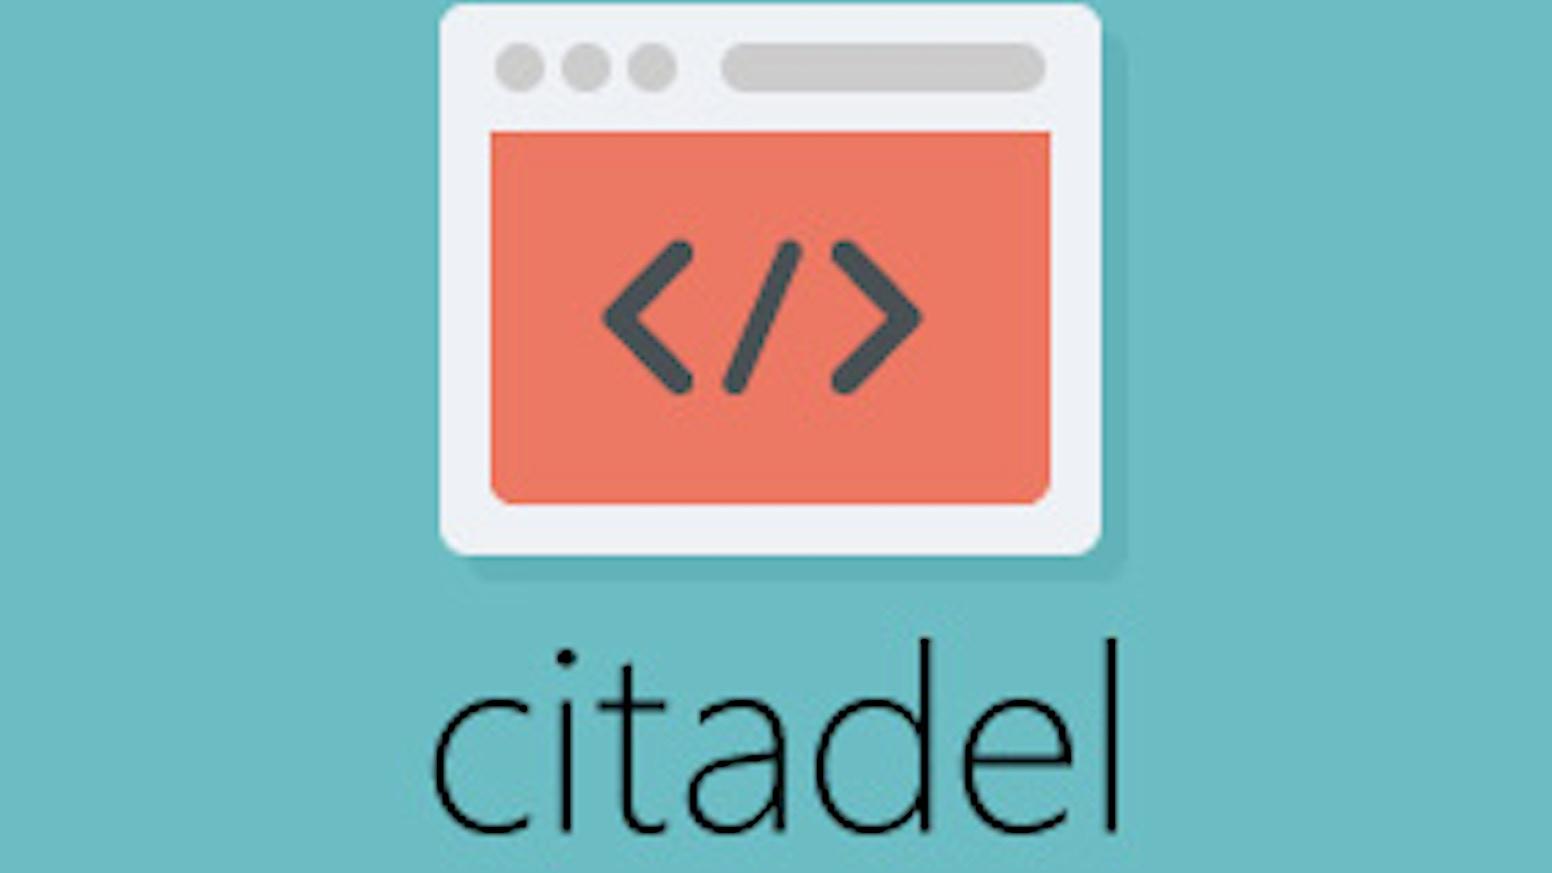 citadel edit any website and save it by noah kickstarter